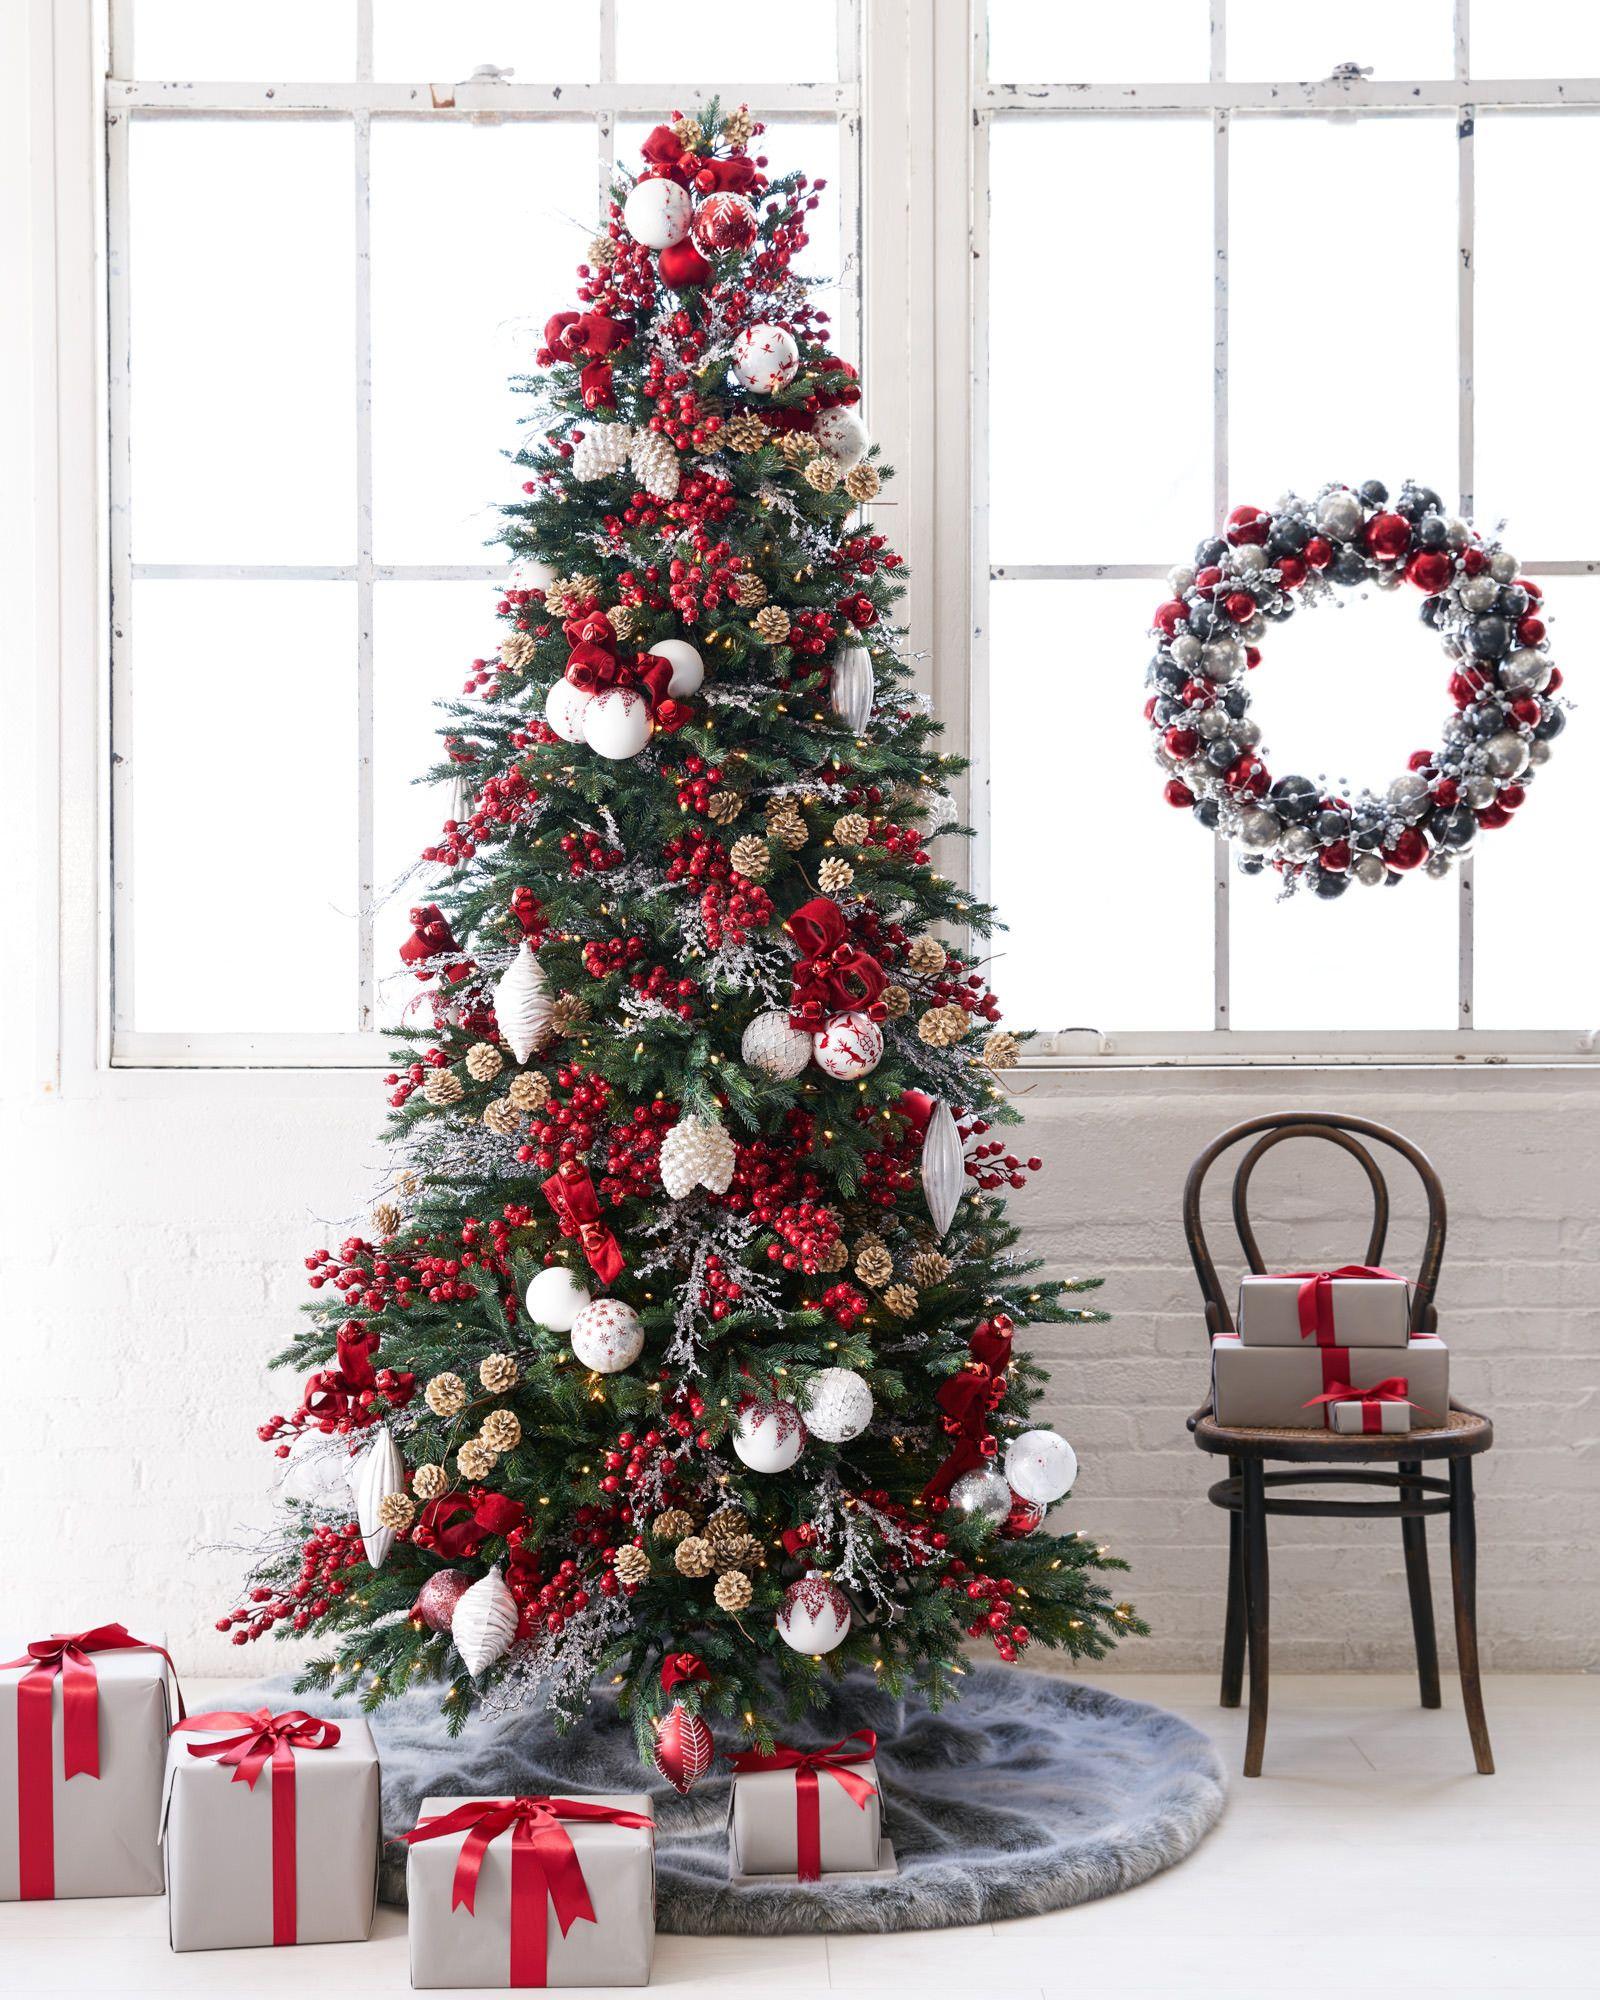 Nordic Frost Ornament Set 25 Pieces